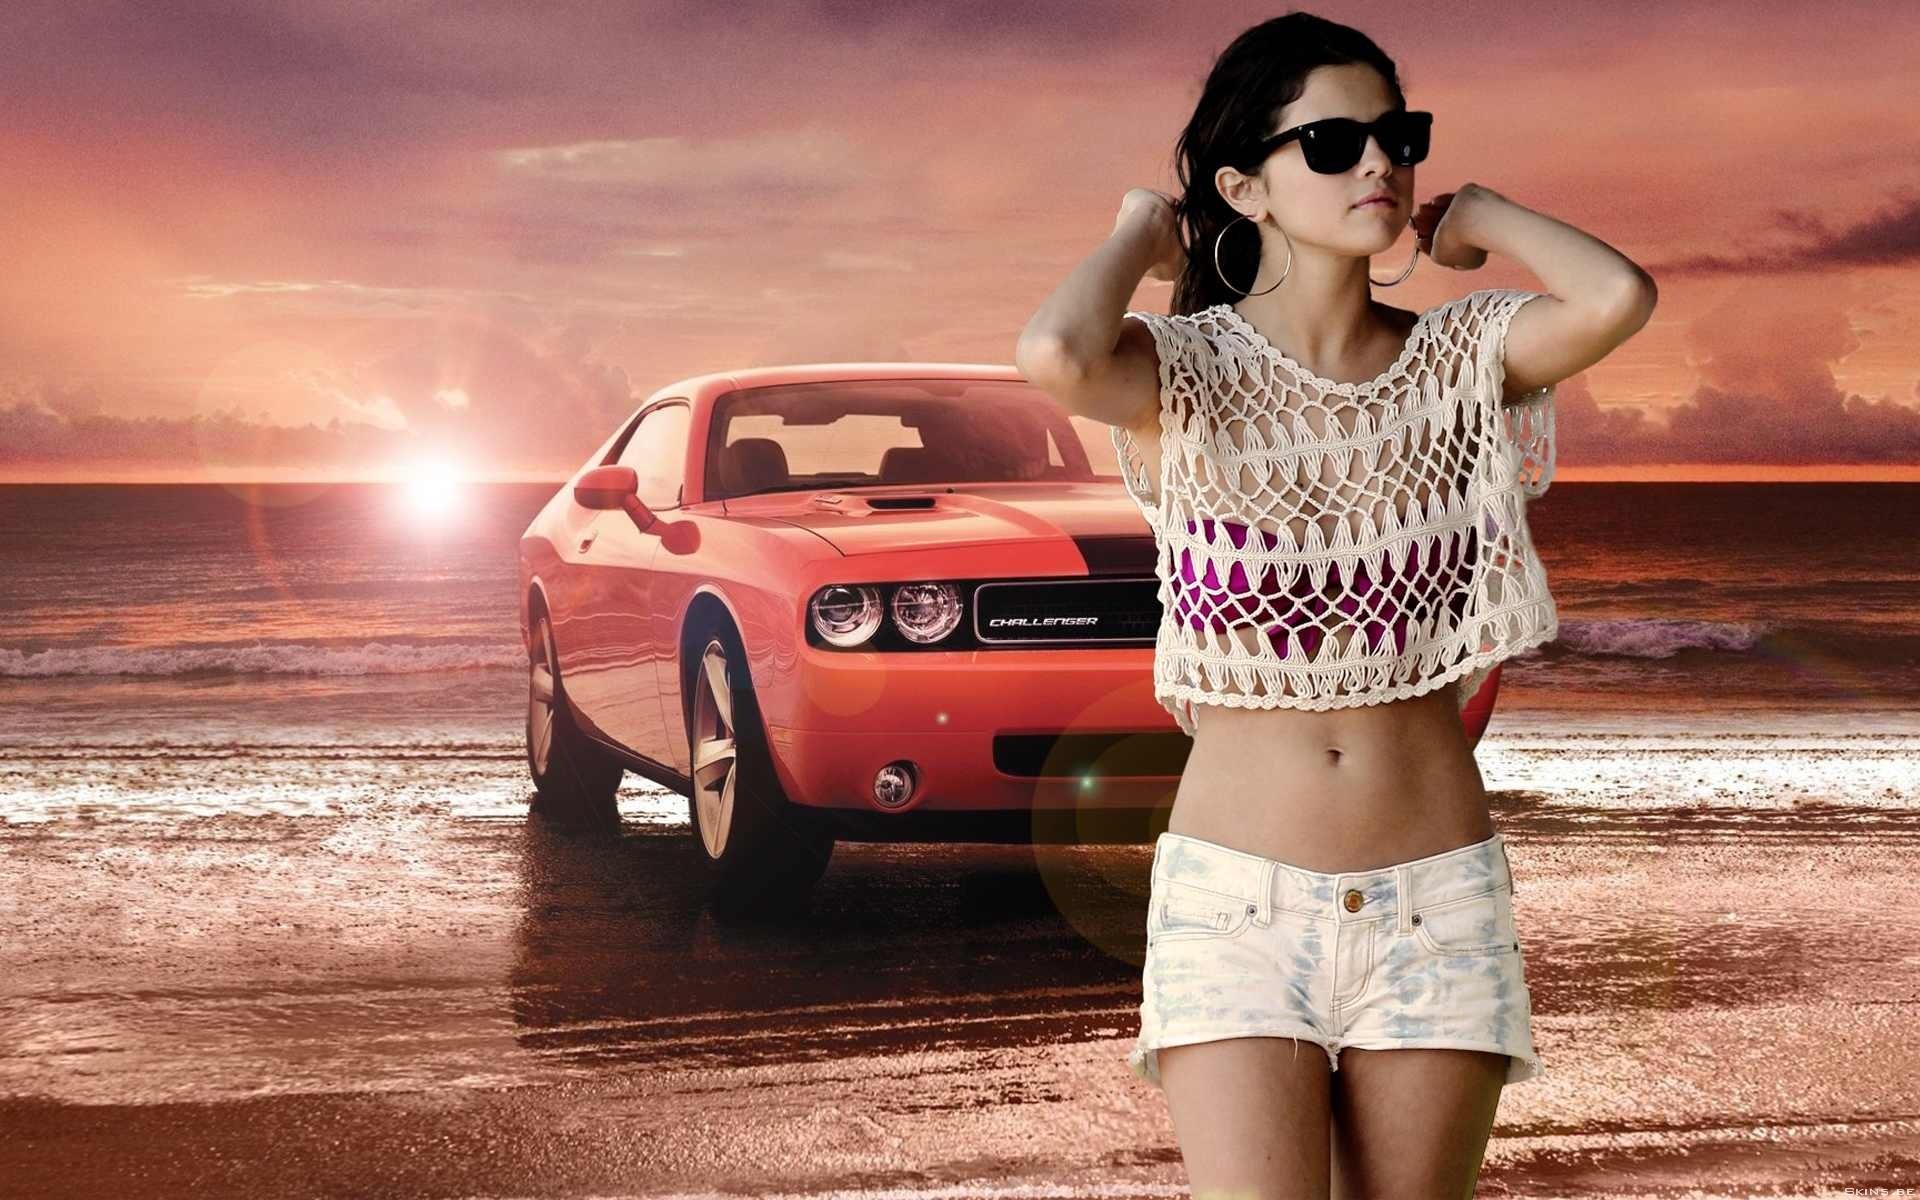 Free Cute Halloween Desktop Wallpapers Selena Gomez Wallpapers Hd A19 Hd Desktop Wallpapers 4k Hd